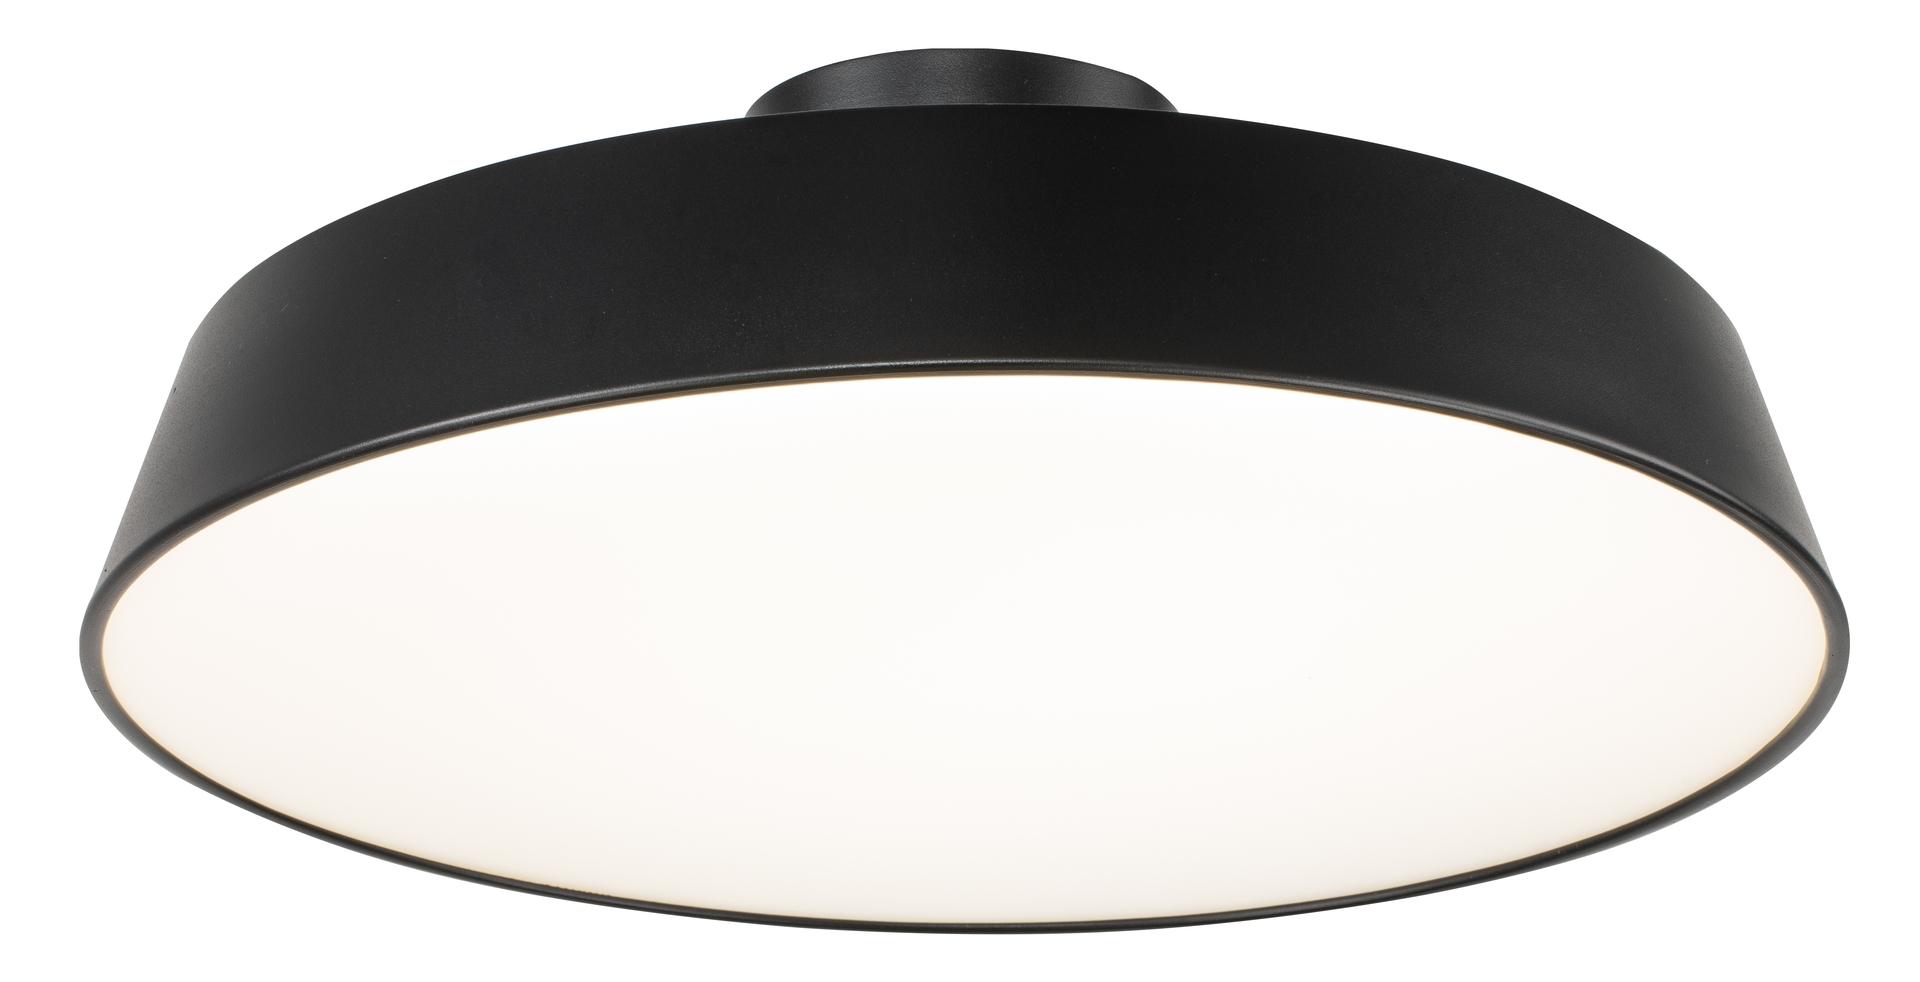 Lampa Sufitowa Orlando 1 Satynowy Czarny 30